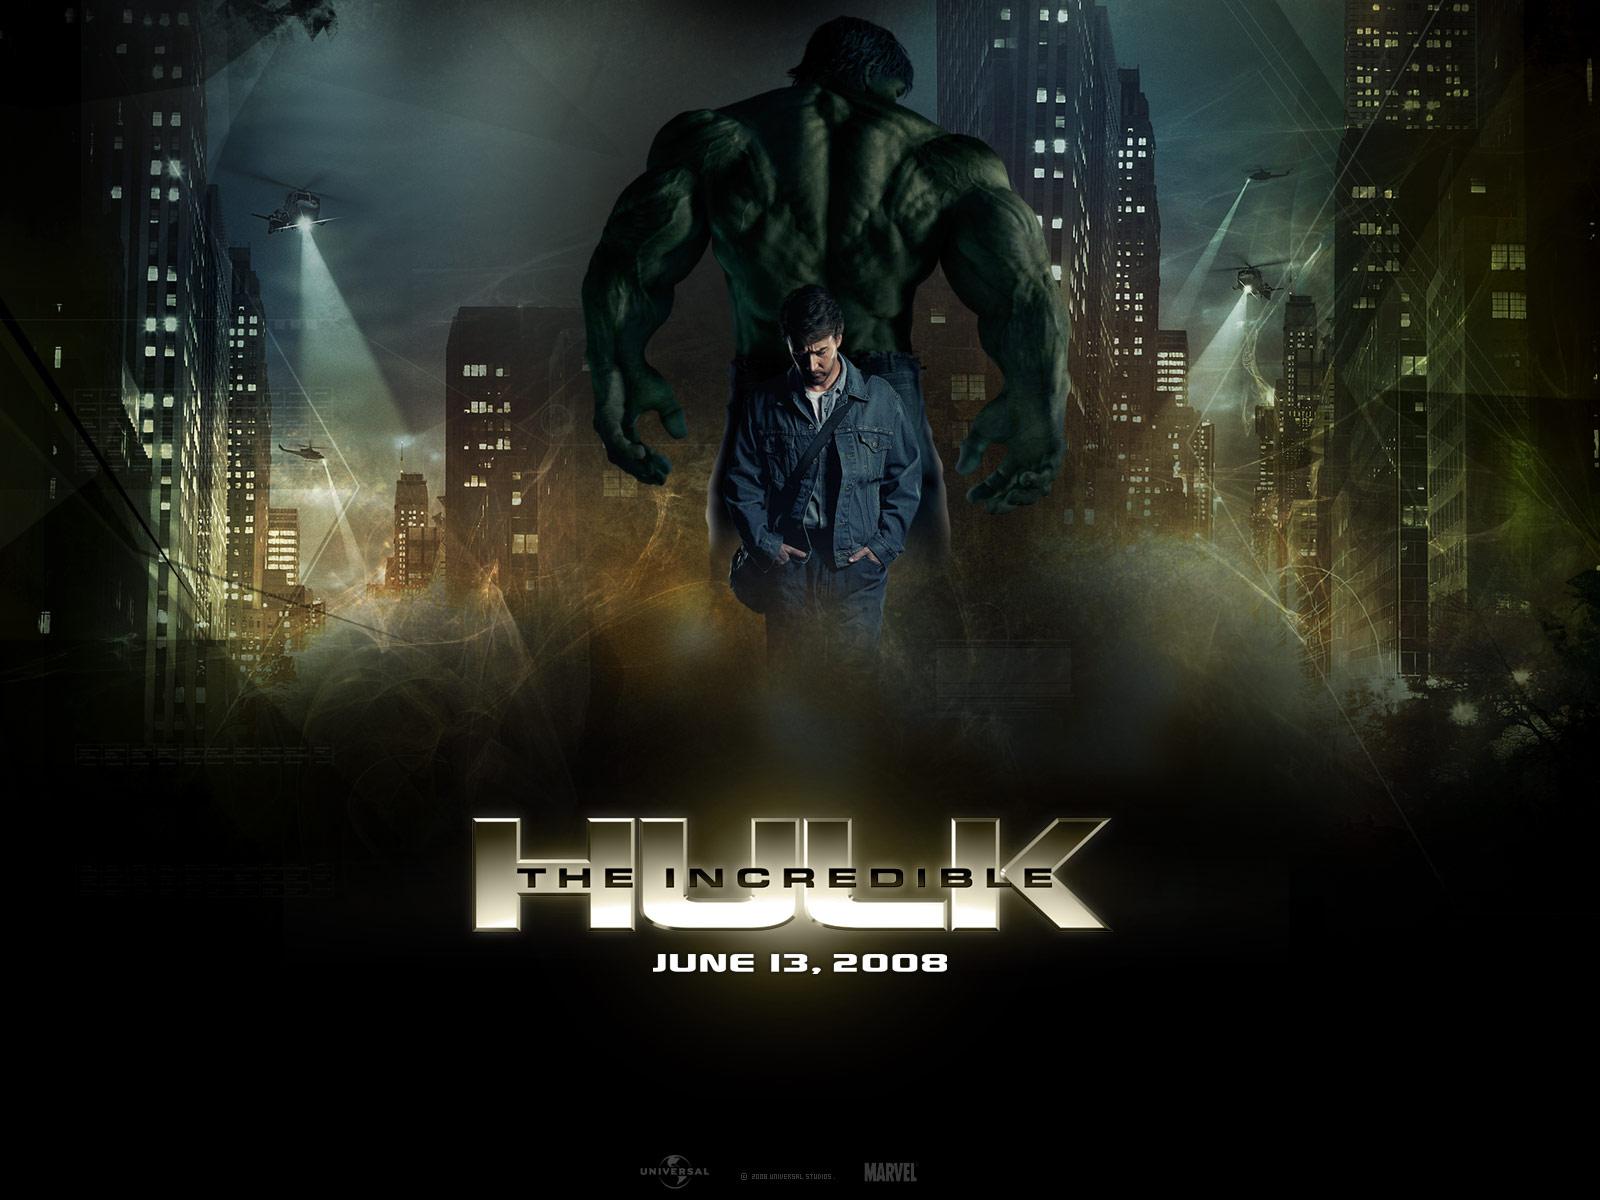 http://3.bp.blogspot.com/_tR4ydijURnA/TK080TUGm_I/AAAAAAAACAU/xflKB8N4H64/s1600/Edward_Norton_in_The_Incredible_Hulk_Wallpaper_8_800.jpg